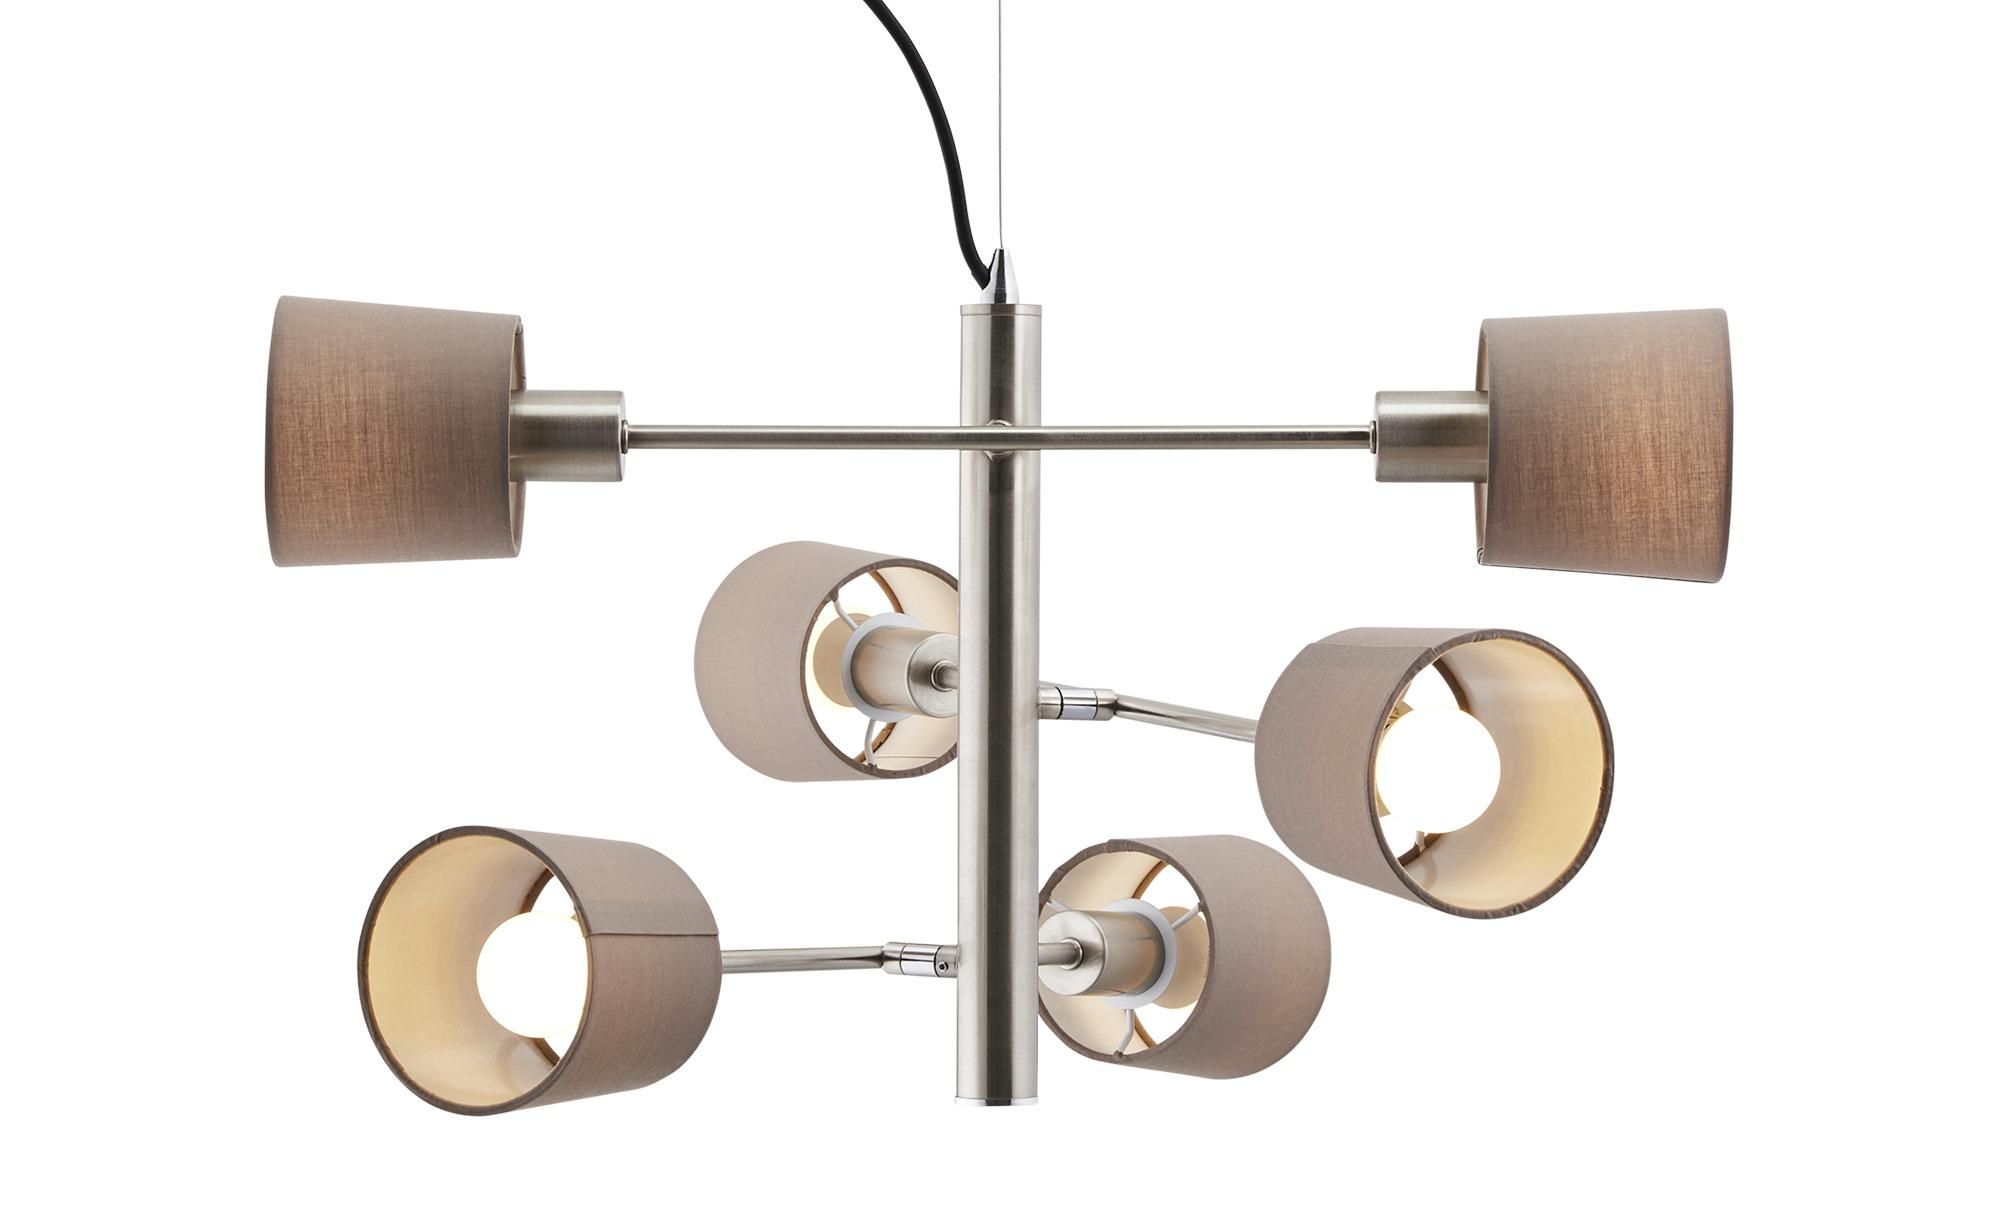 Pendelleuchte, 6-flammig ¦ silber ¦ Maße (cm): B: 57 H: 120 Lampen & Leuchten > LED-Leuchten > LED-Pendelleuchten - Höffner